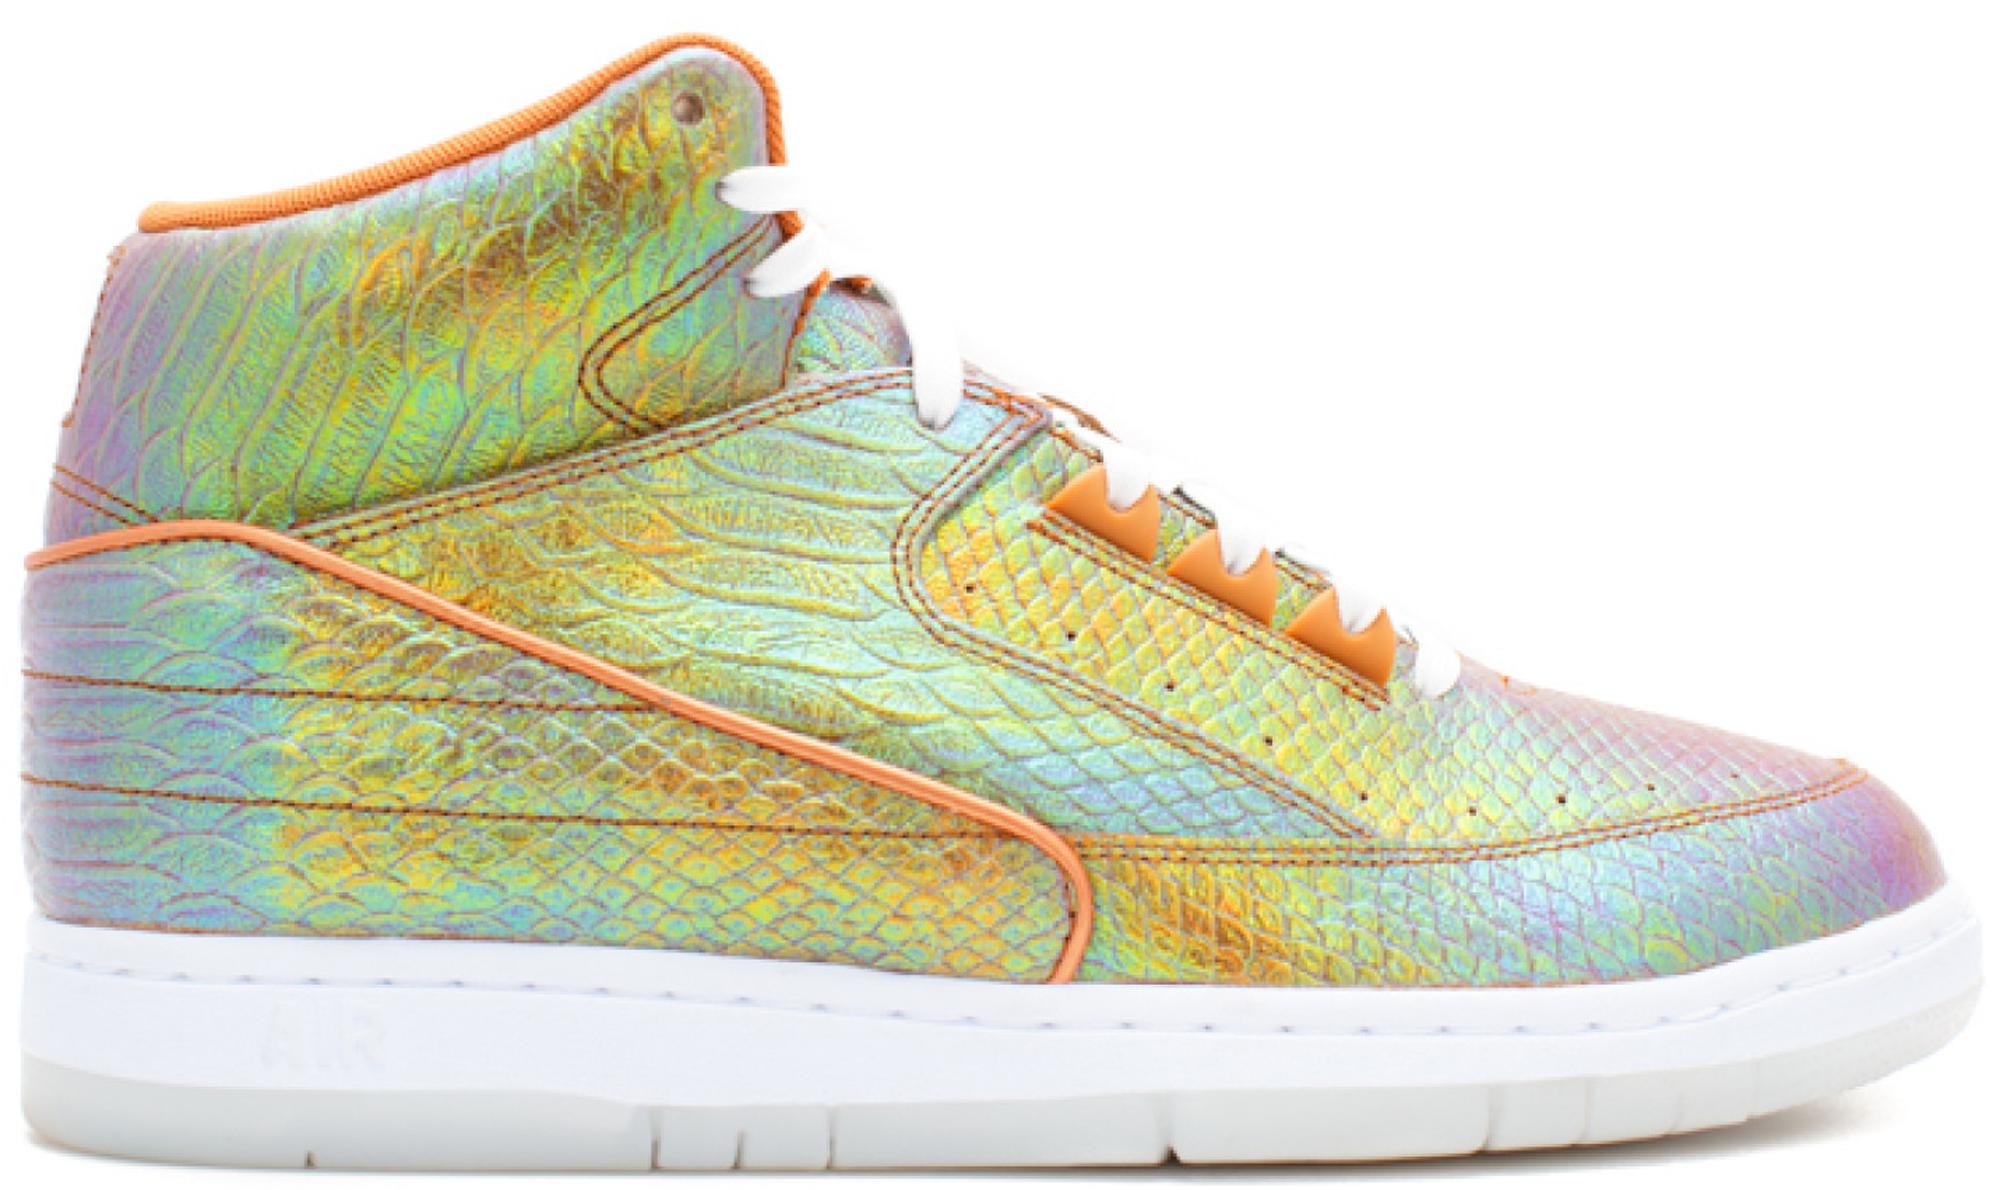 Nike Air Python Iridescent - 705066-202